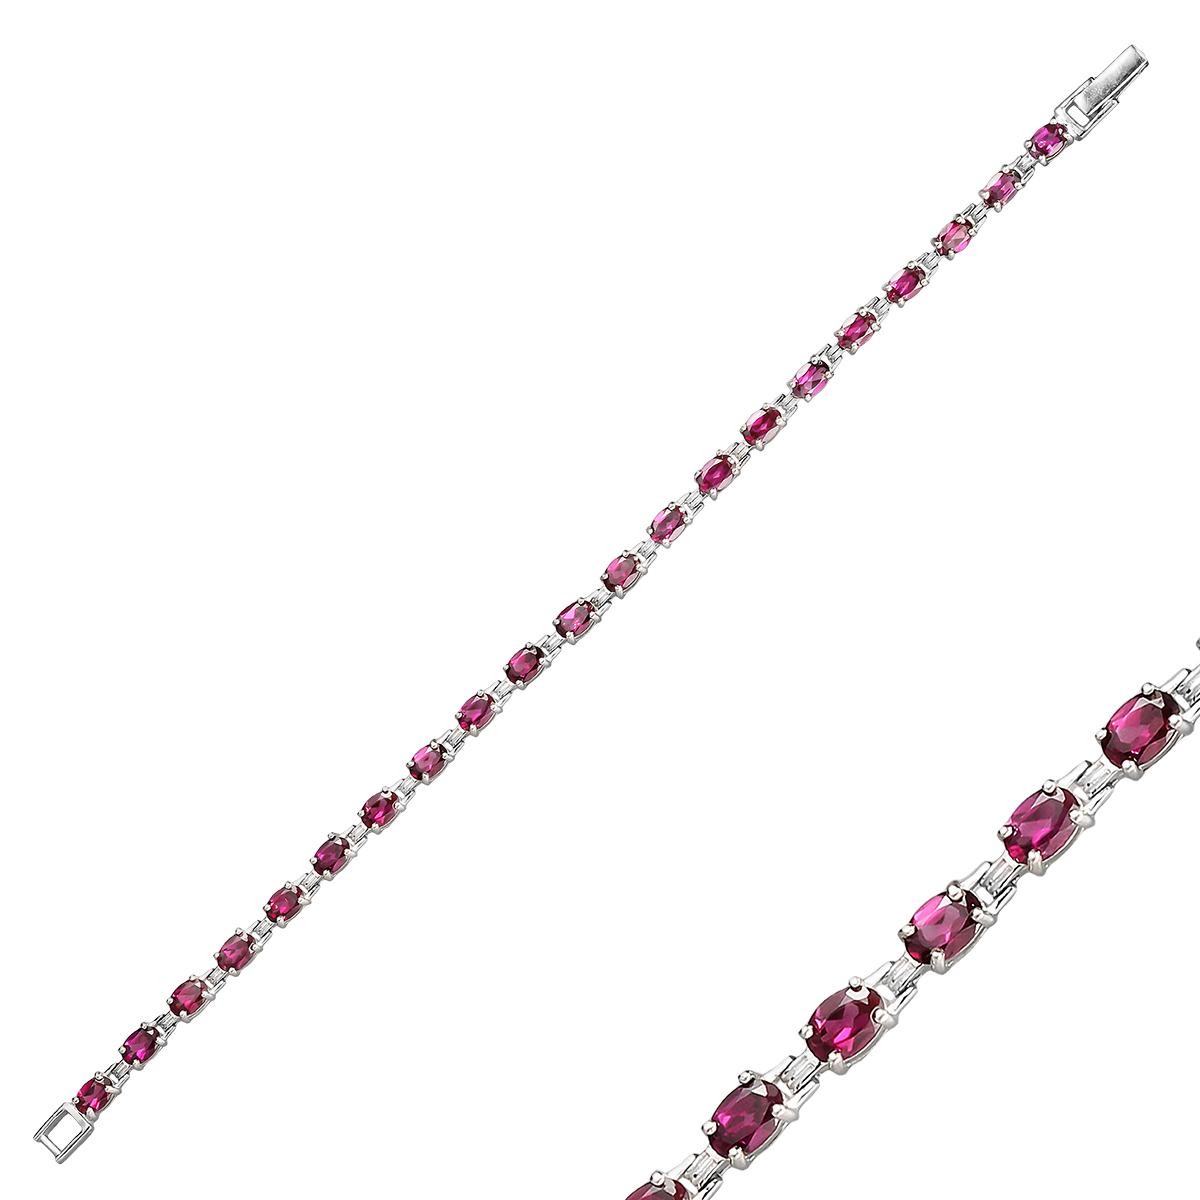 Браслет женский Balex Jewellery 7405937818 из серебра, родолит, р. 21